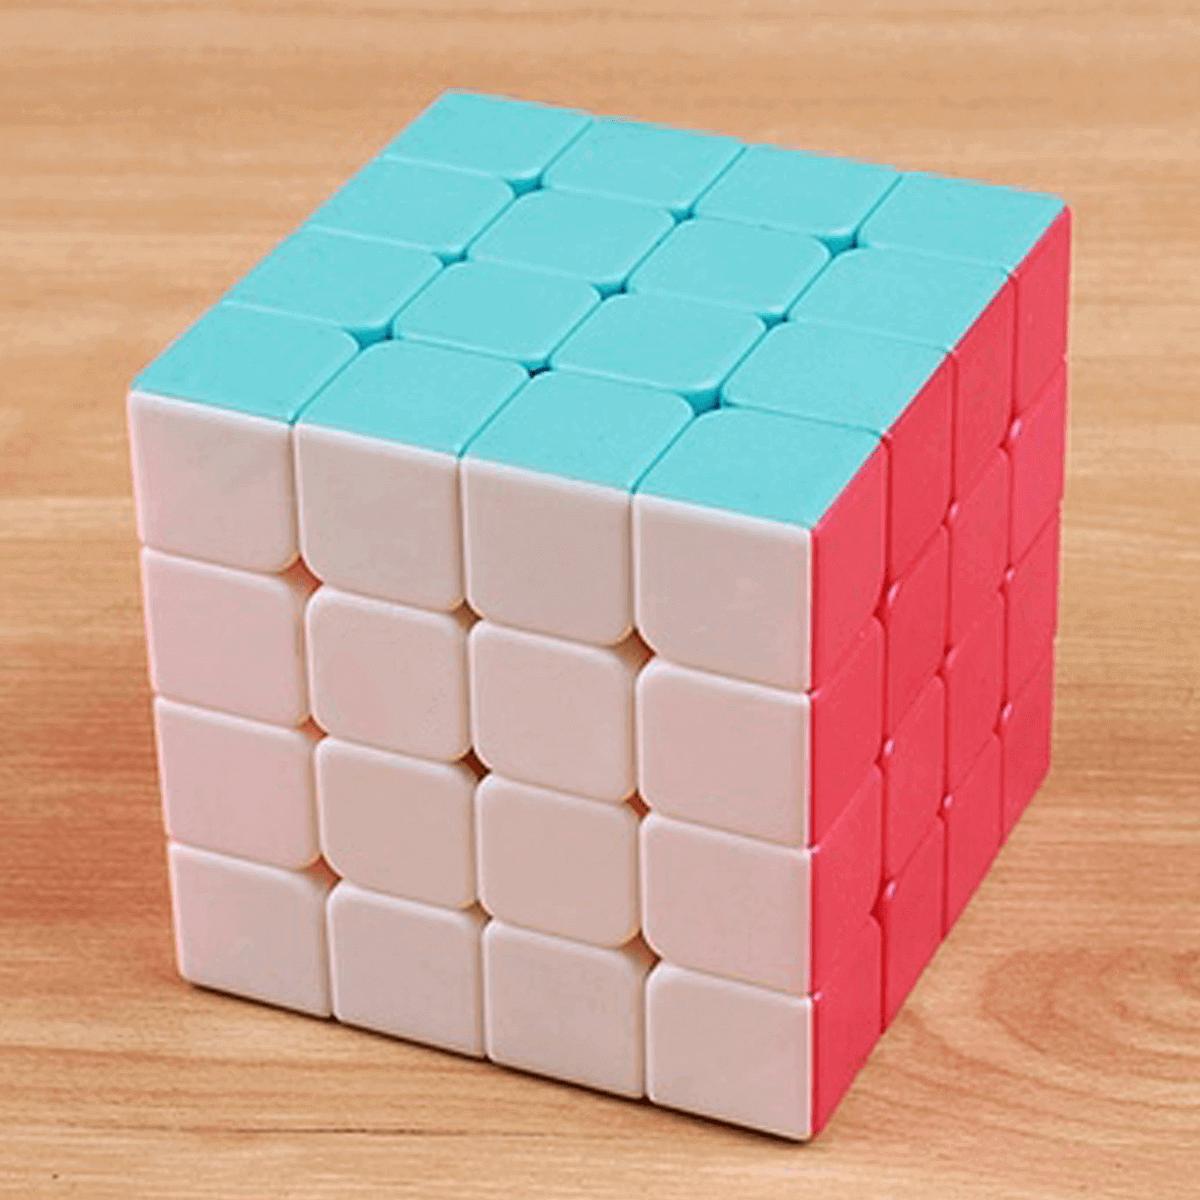 Cubo Mágico Profissional 4x4 (JHT344) Fidget